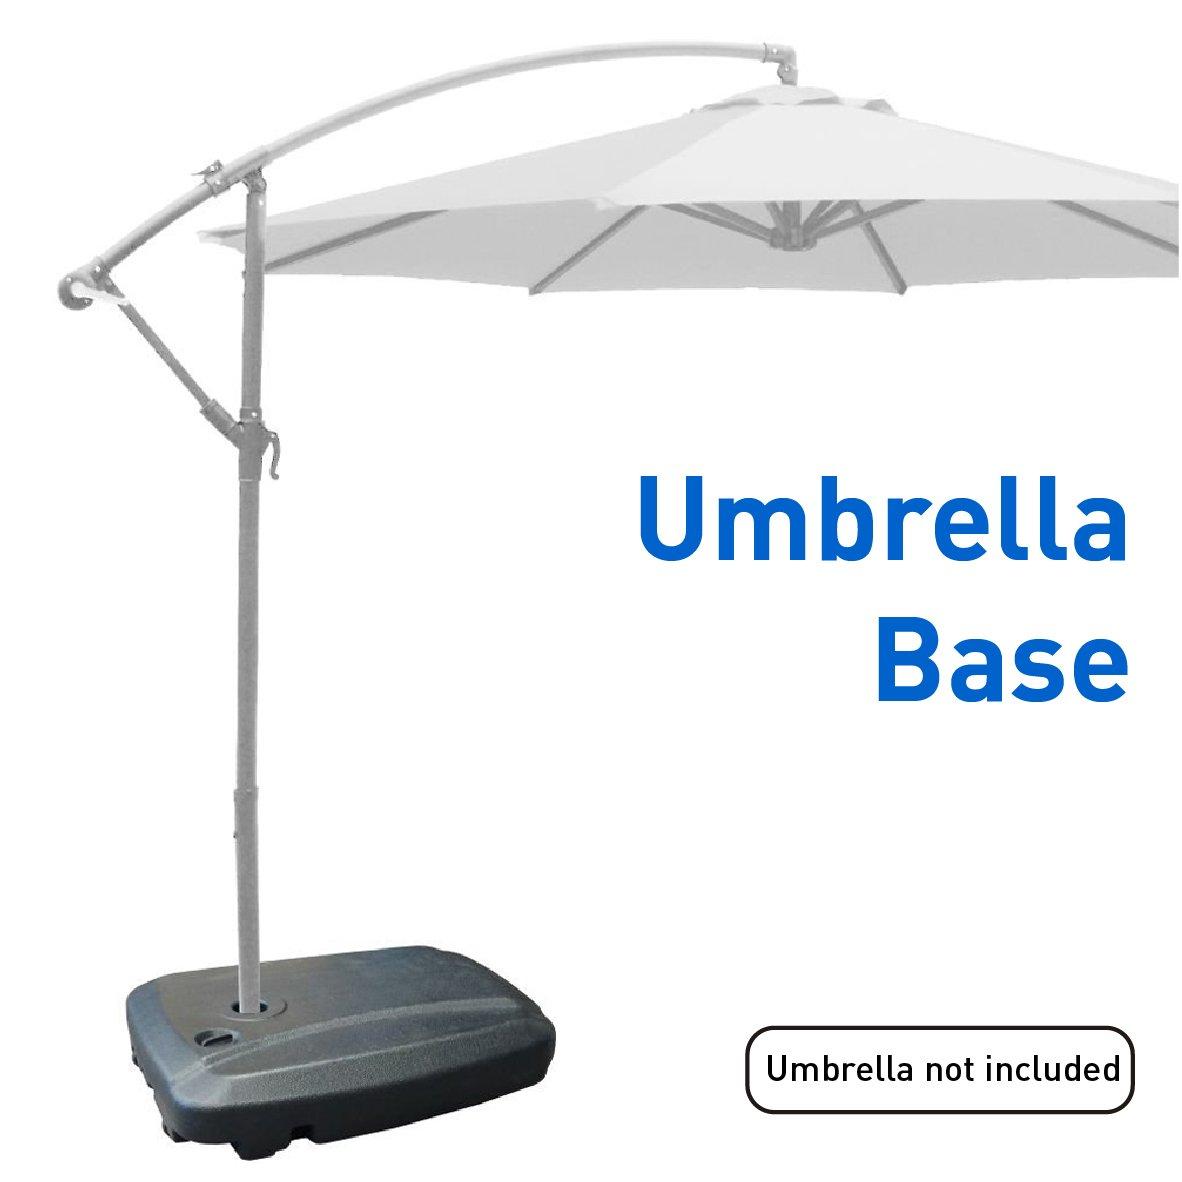 EasyGoProducts EGP-BASE-003 Universal Offset Umbrella Base Weight Capacity-Plasti, Black